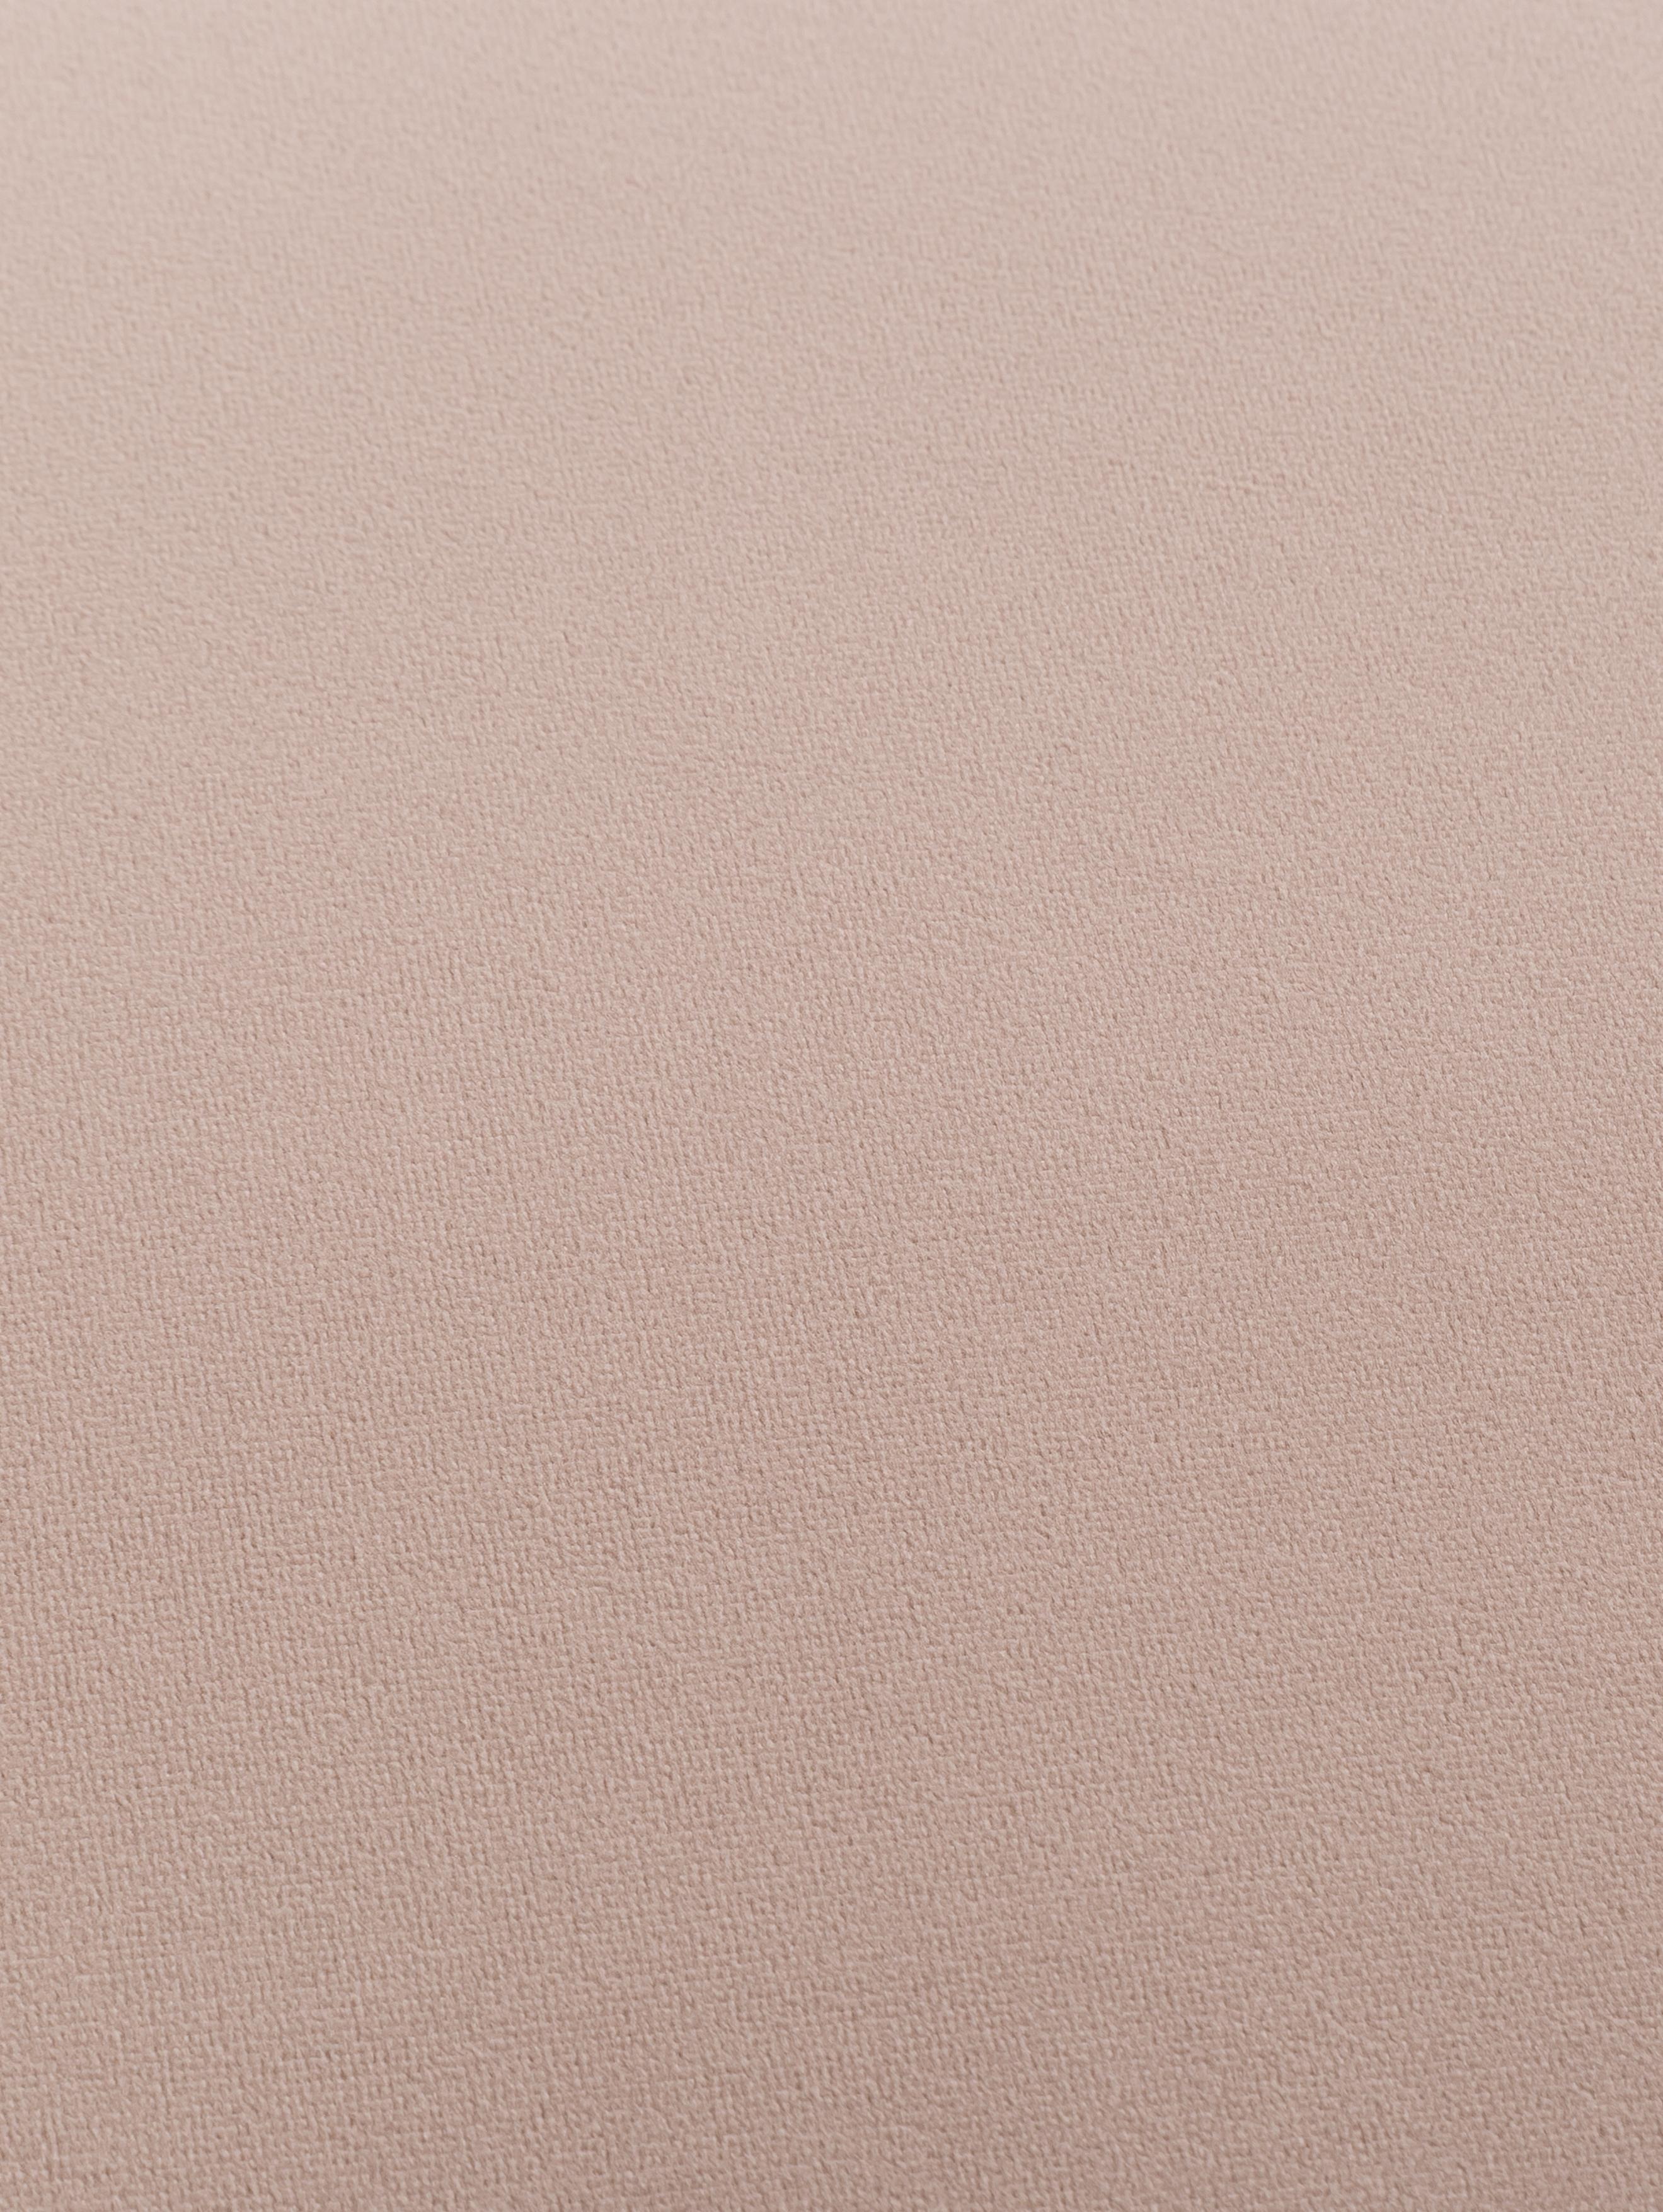 Samt-Polsterbank Popy, Bezug: Polyestersamt 50.000 Sche, Beine: Gummibaumholz, klar lacki, Altrosa, 100 x 50 cm